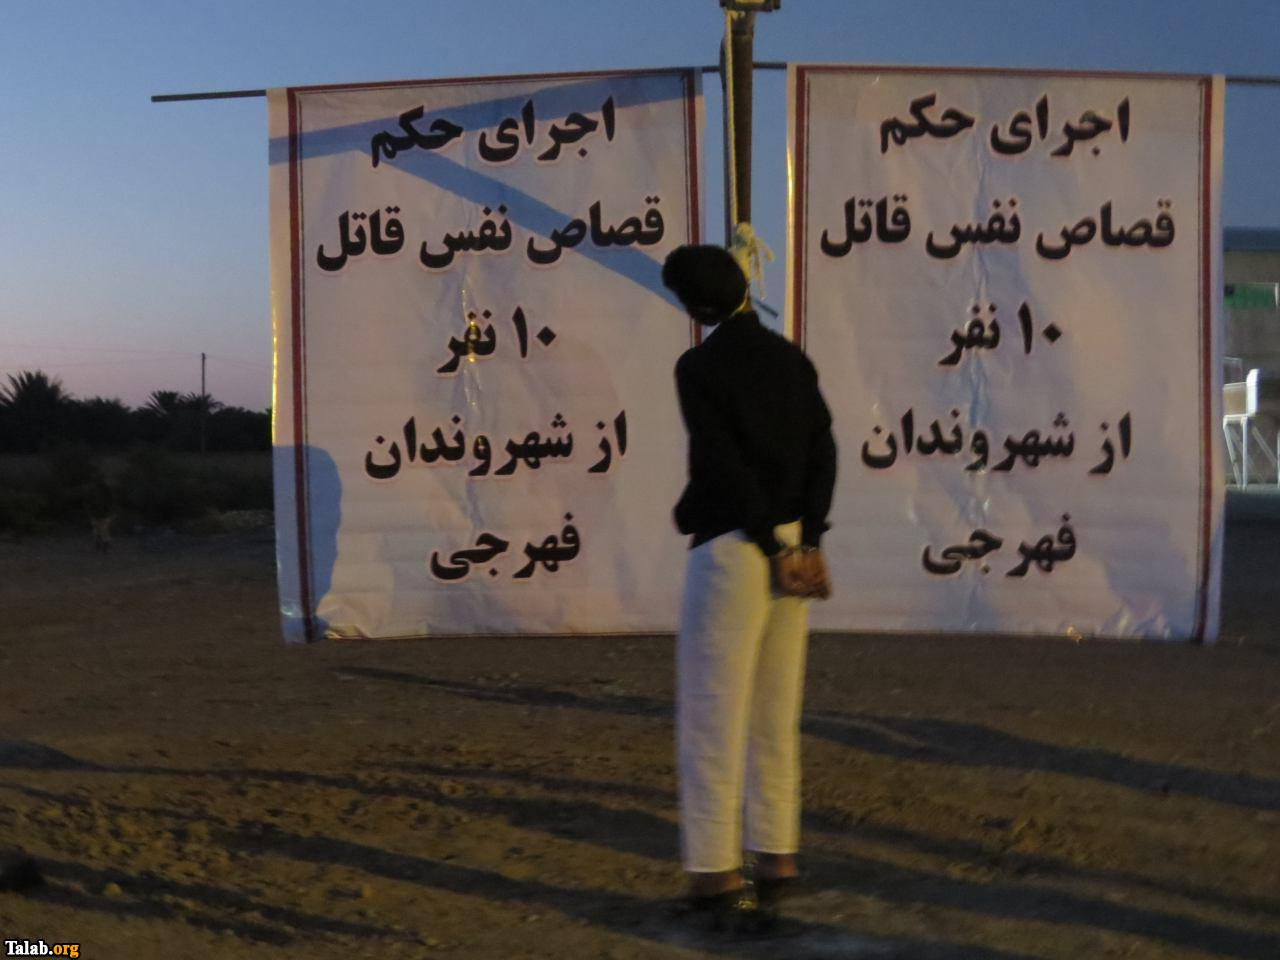 قصاص قاتل 10 شهروند کرمانی در ملاء عام (عکس)